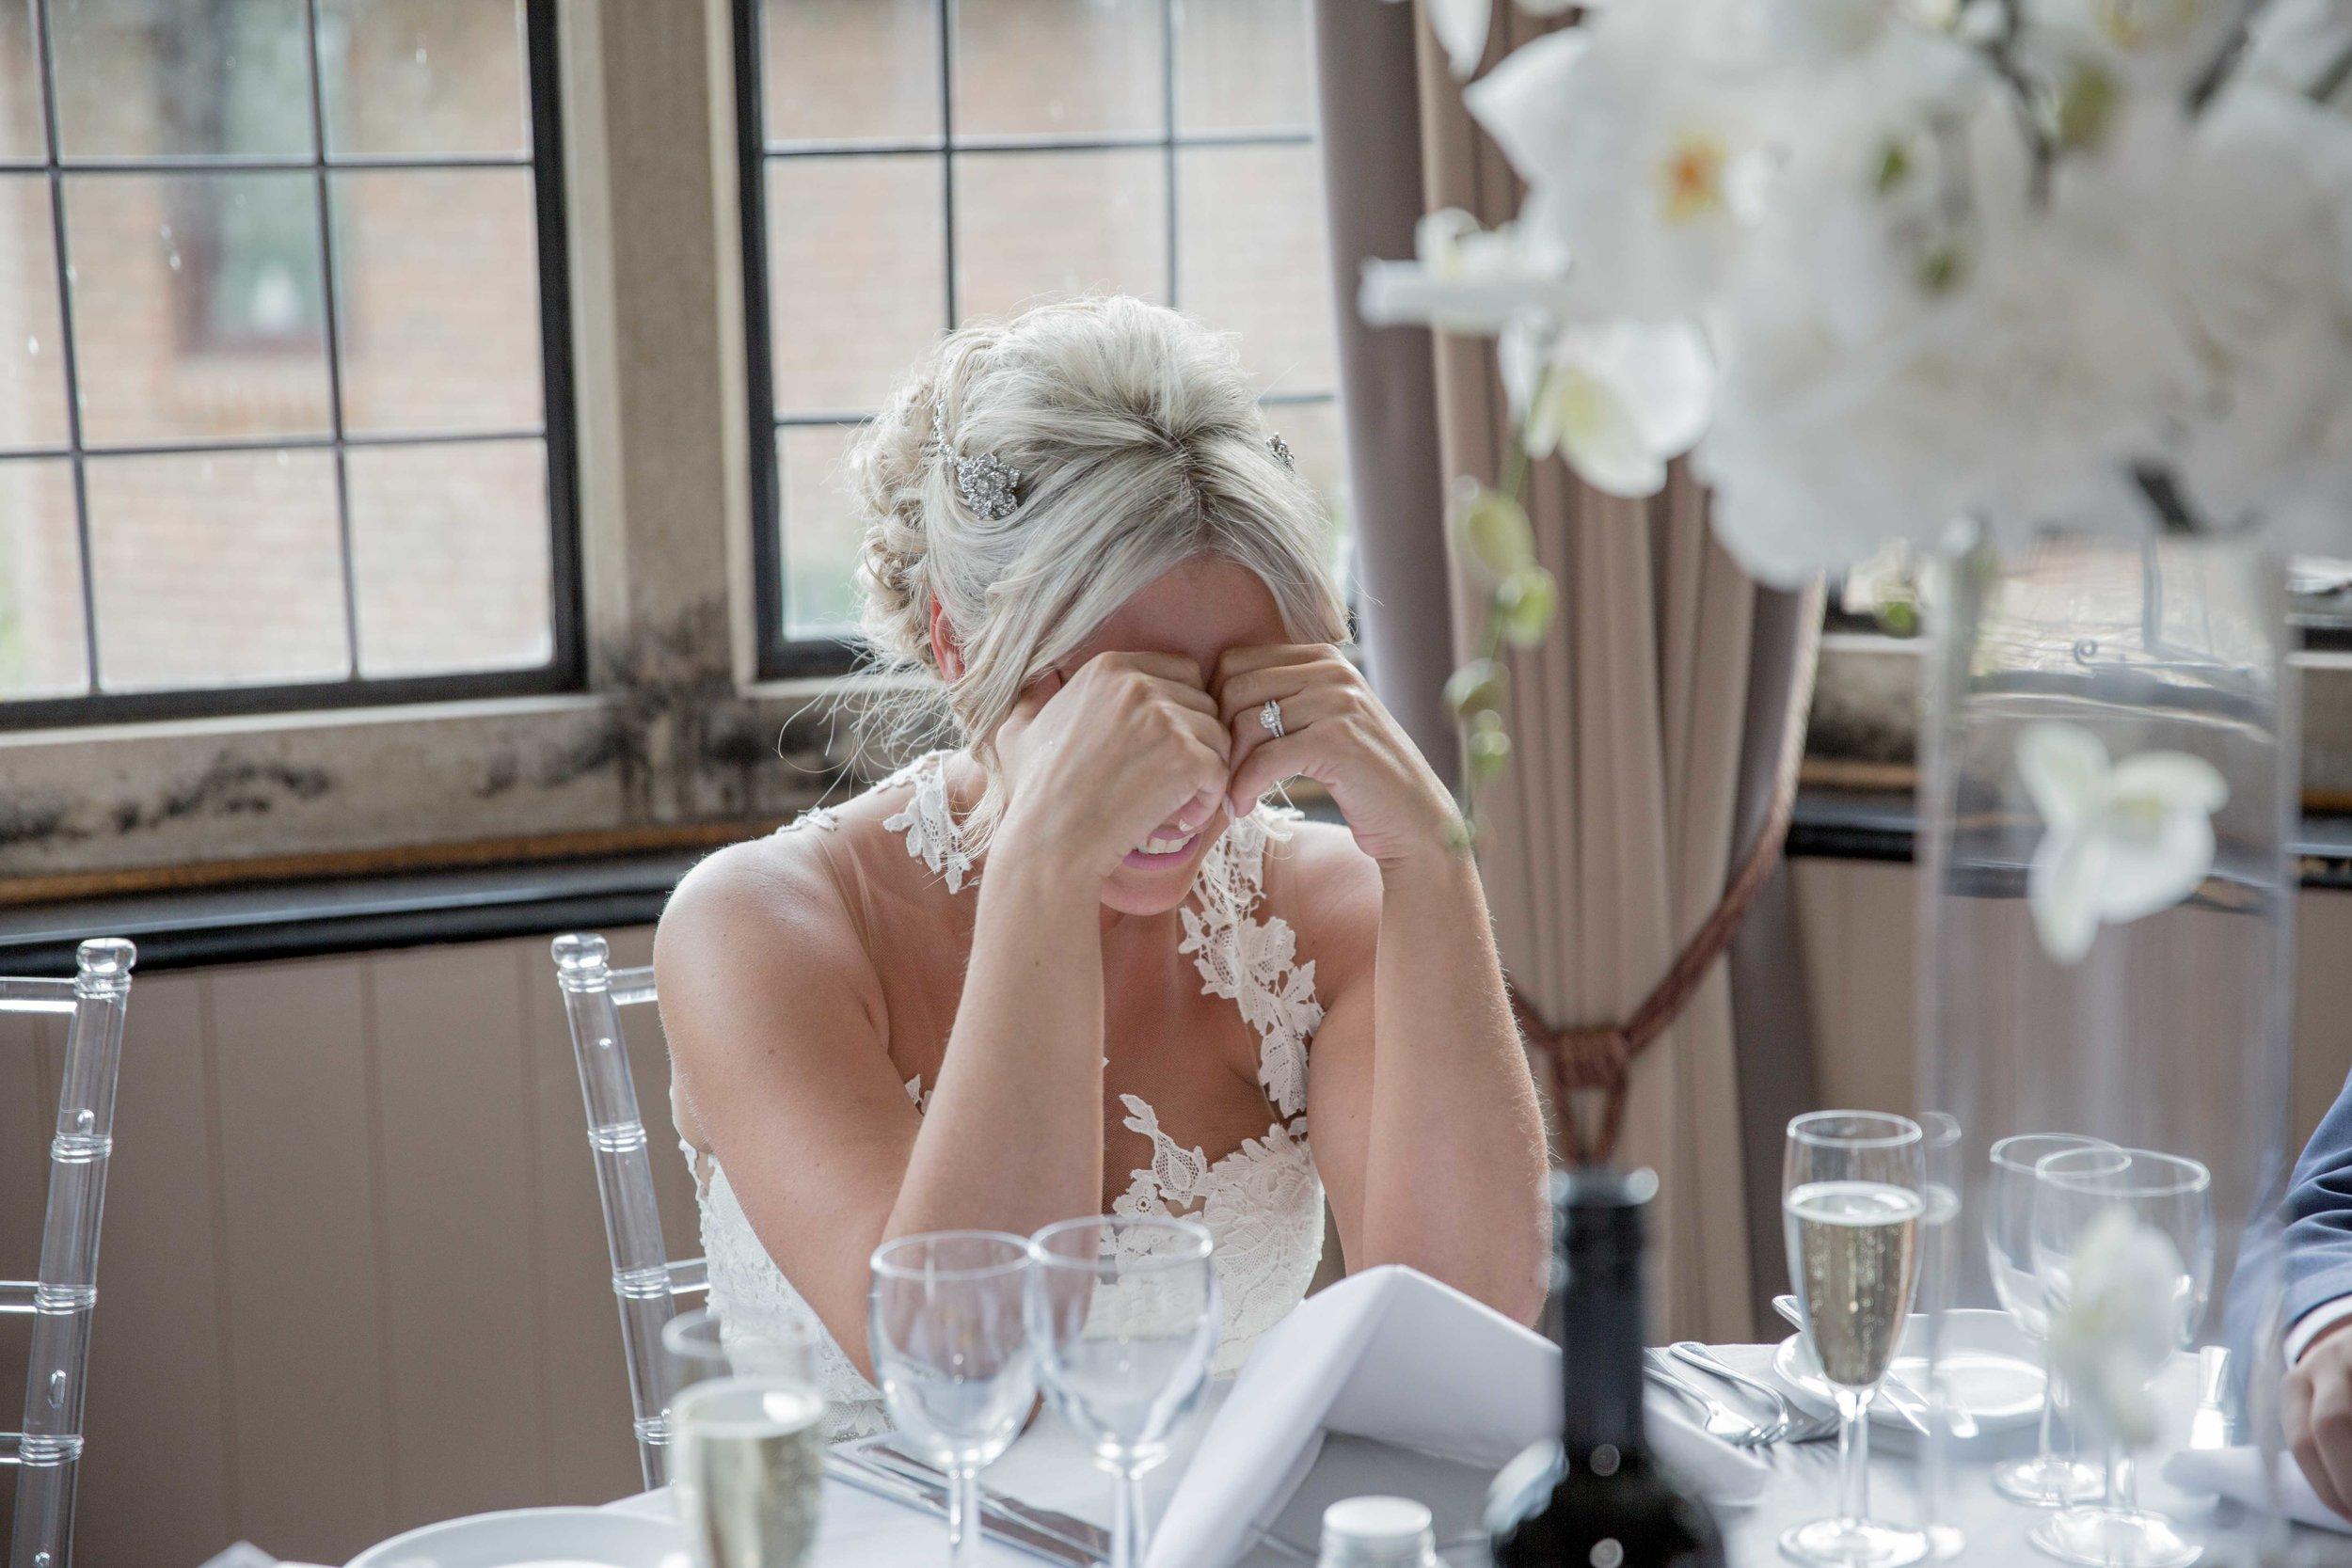 cotswold-wedding-photography-at-stonehouse-court-hotel-natalia-smith-photography-gloucestershire-wedding-photographer-79.jpg